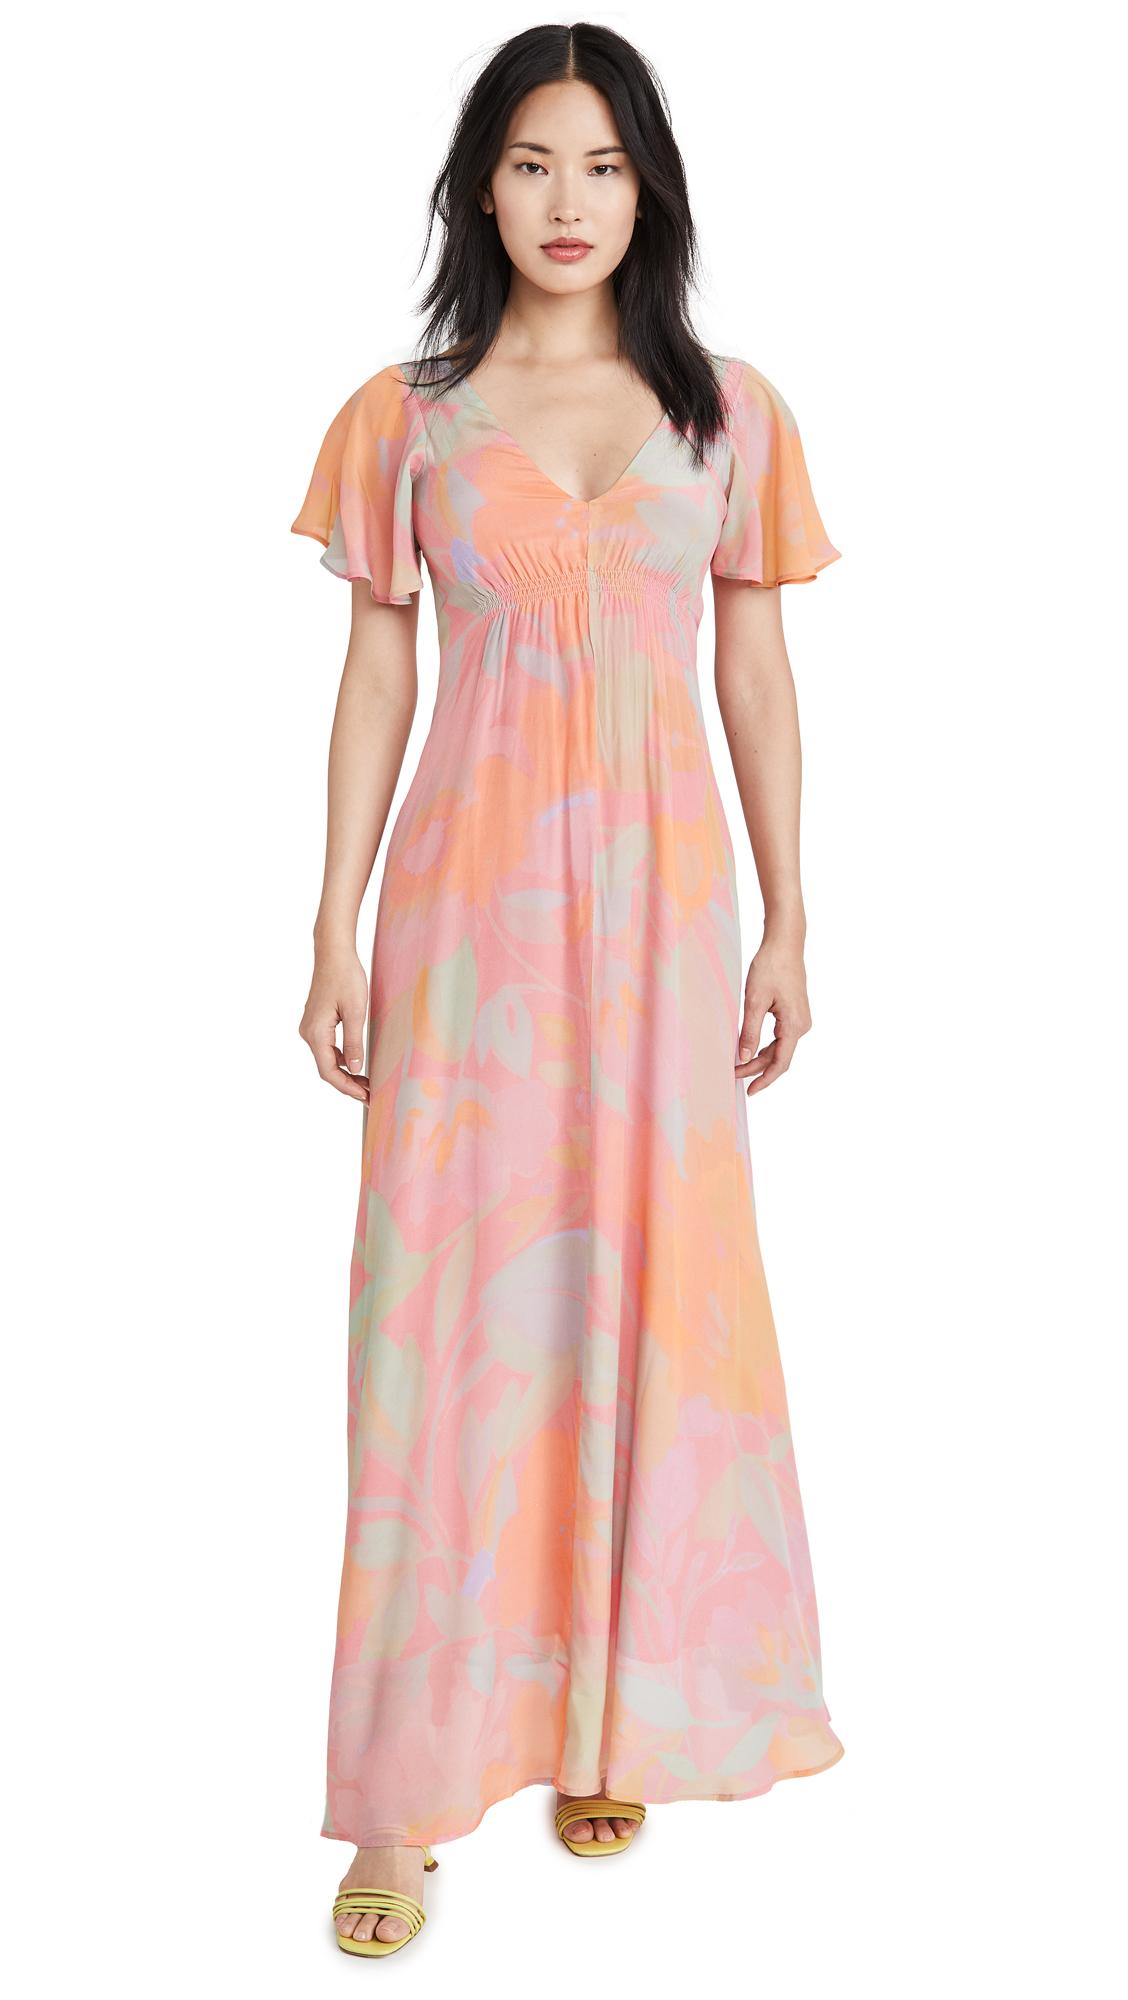 Photo of VEDA Corazon Crepe Dress - shop VEDA Clothing, Dresses online